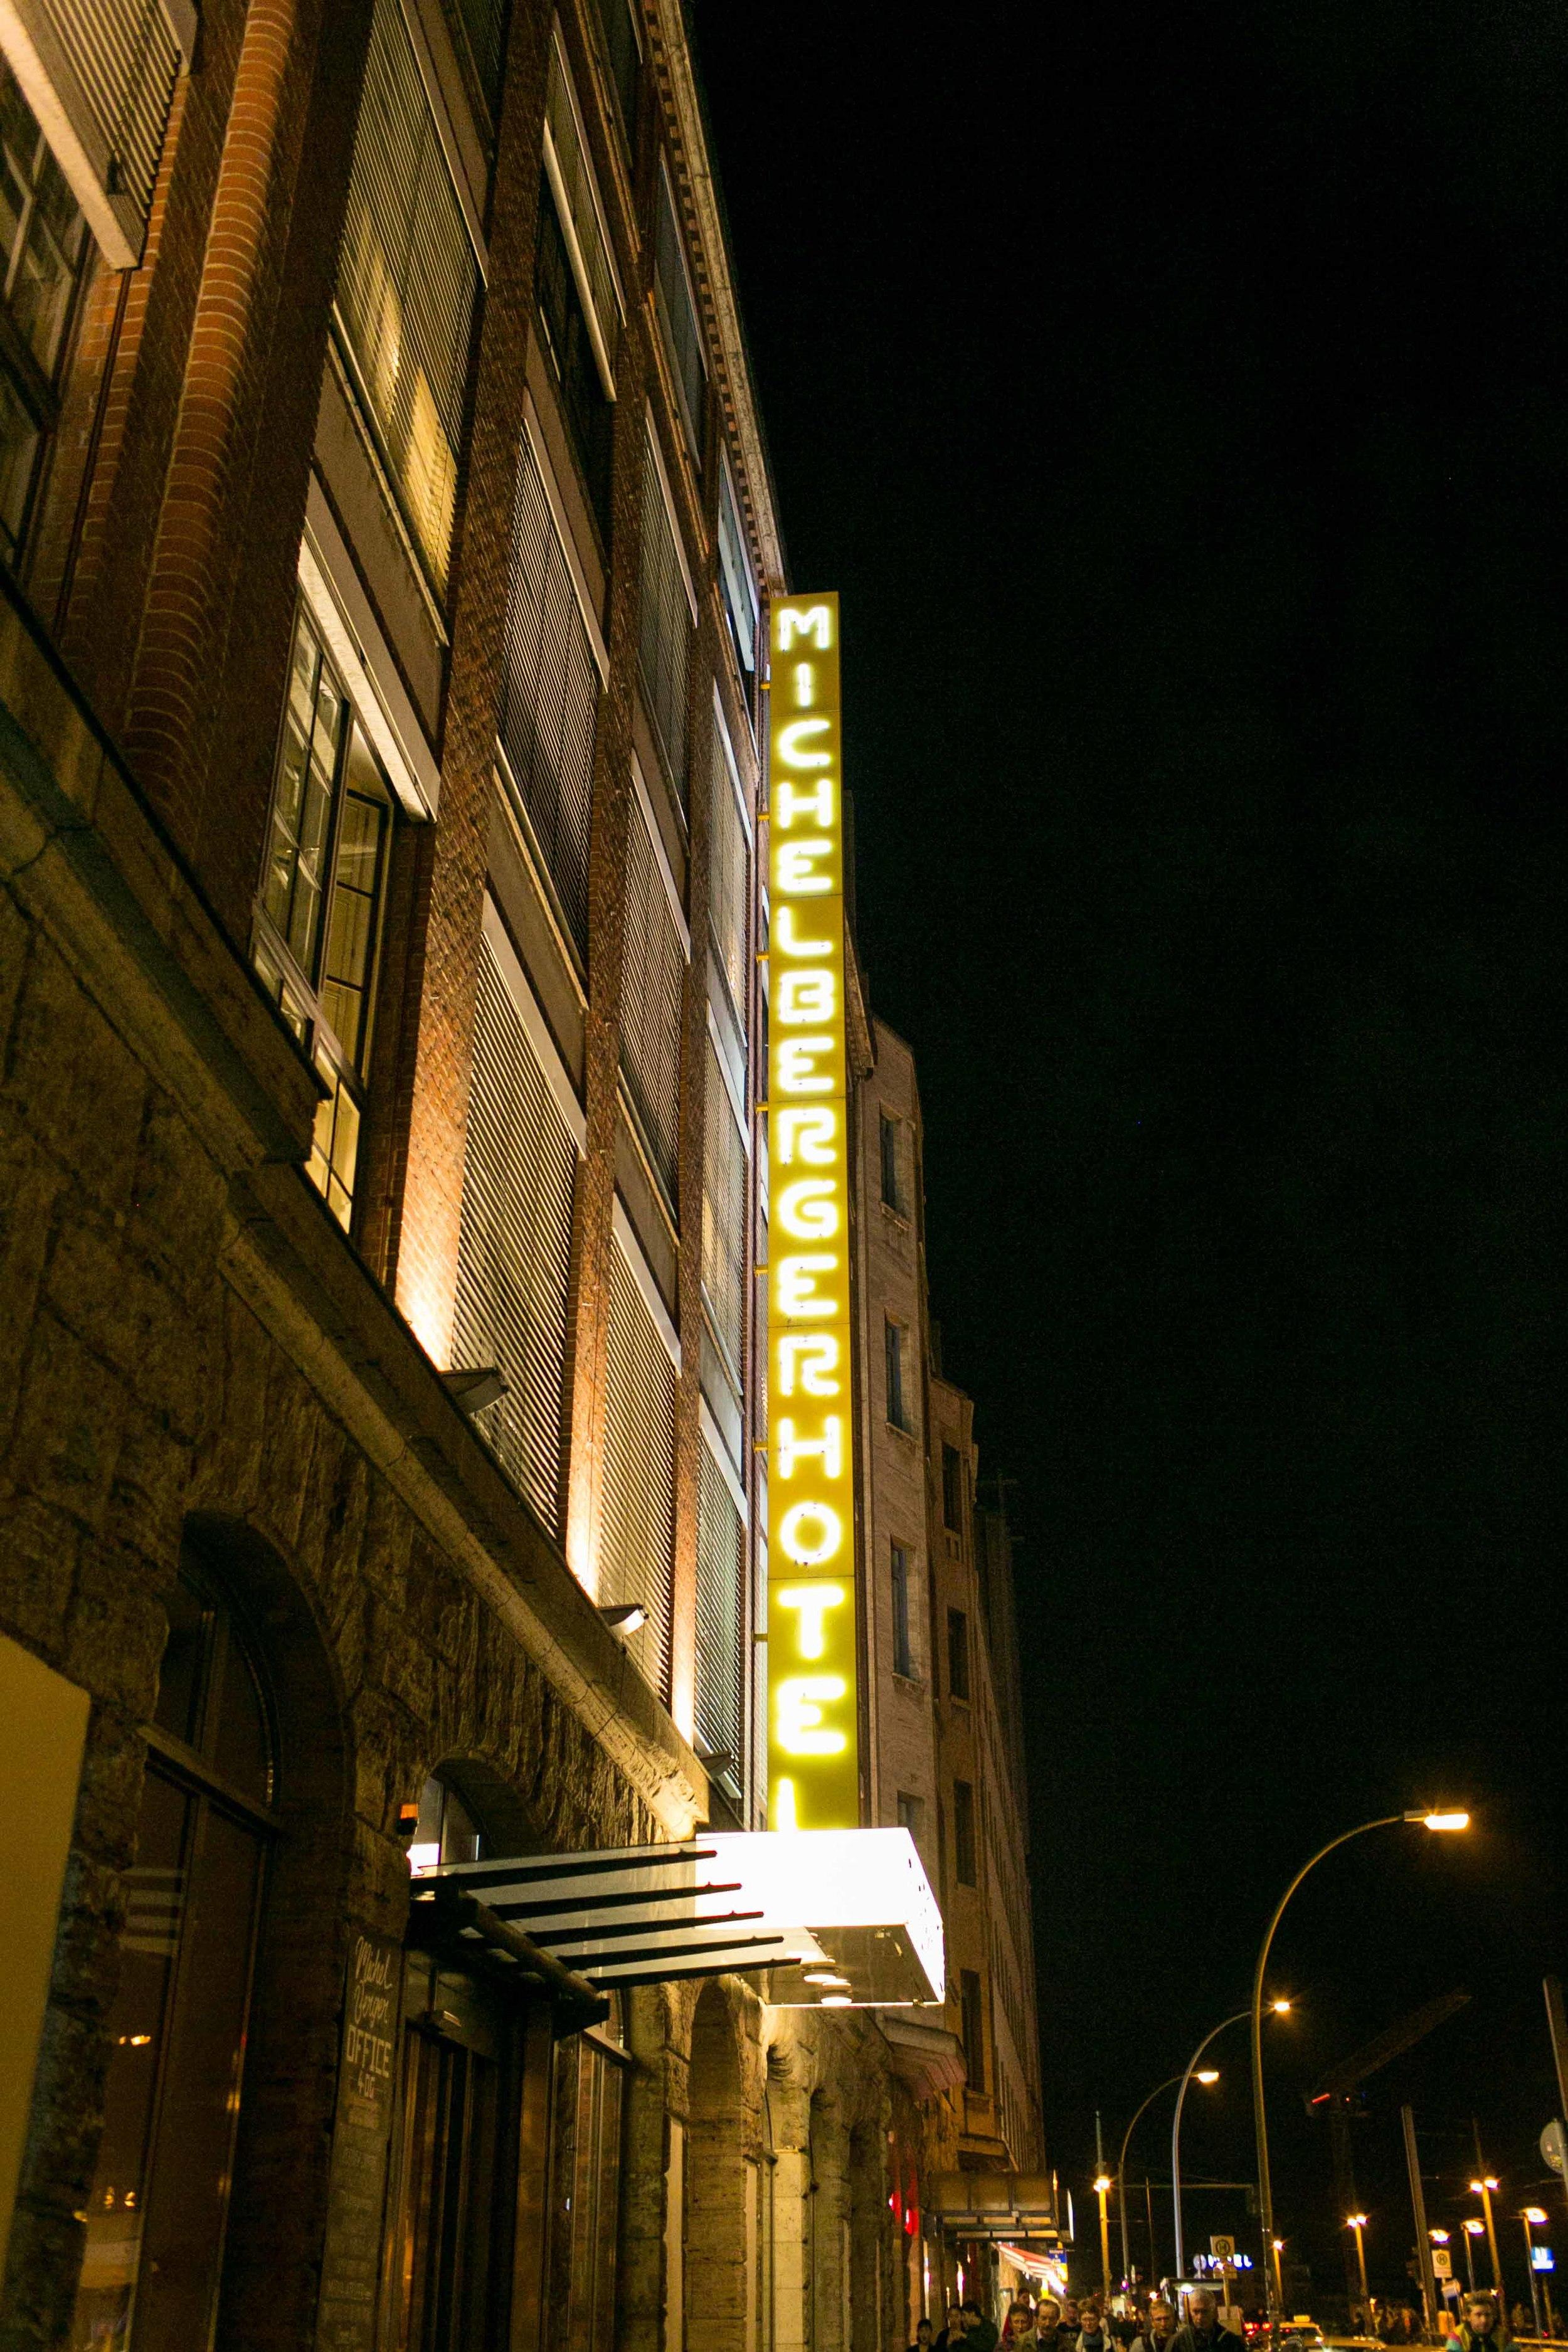 Michelberger Hotel Berlin Hochzeitsfotografie_Fran Burrows Fotografie-111.jpg